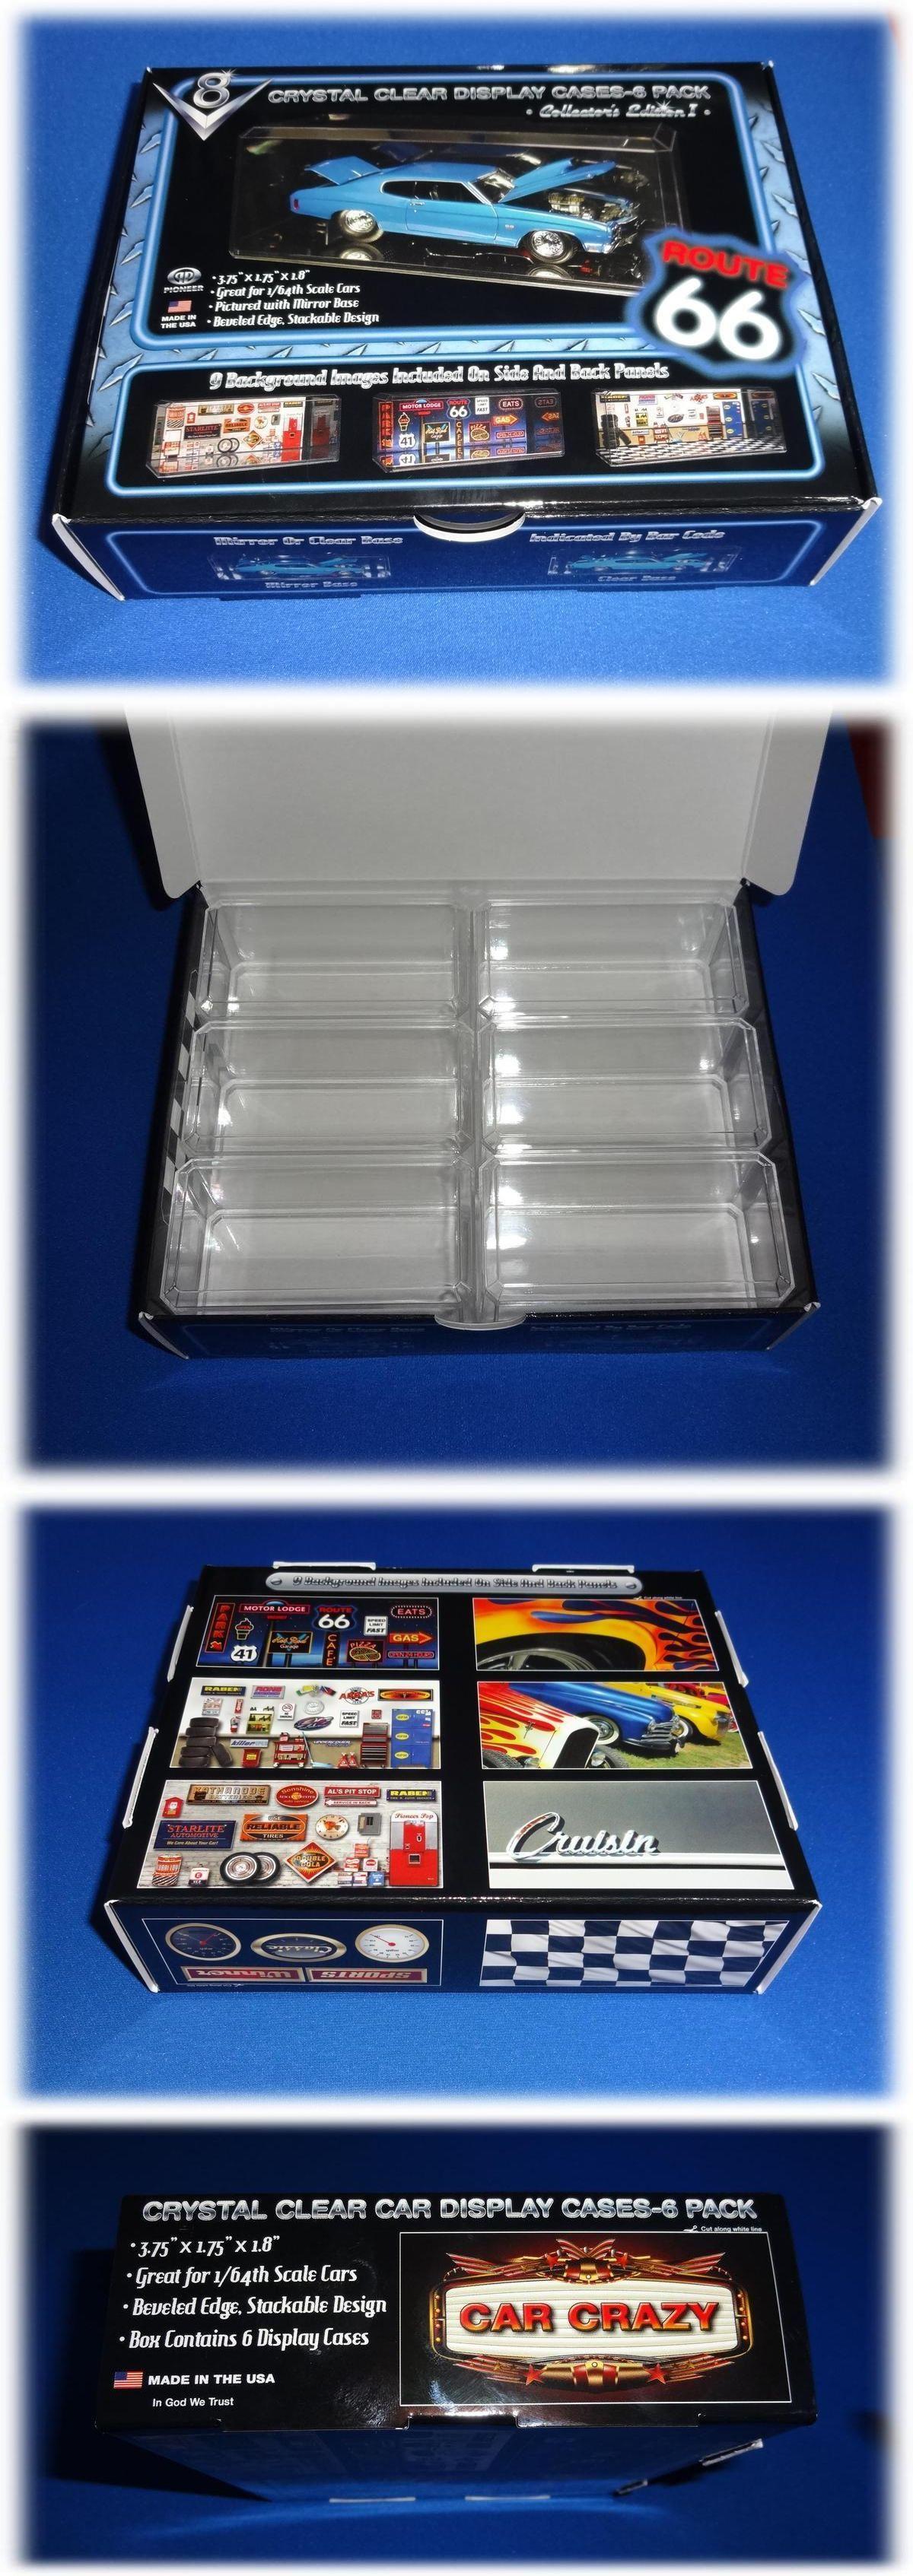 6 New 1 64 Scale Crystal Clear Acrylic Display Cases Matchbox Hot Wheels Nascar Ebay Acrylic Display Case Display Case Clear Acrylic